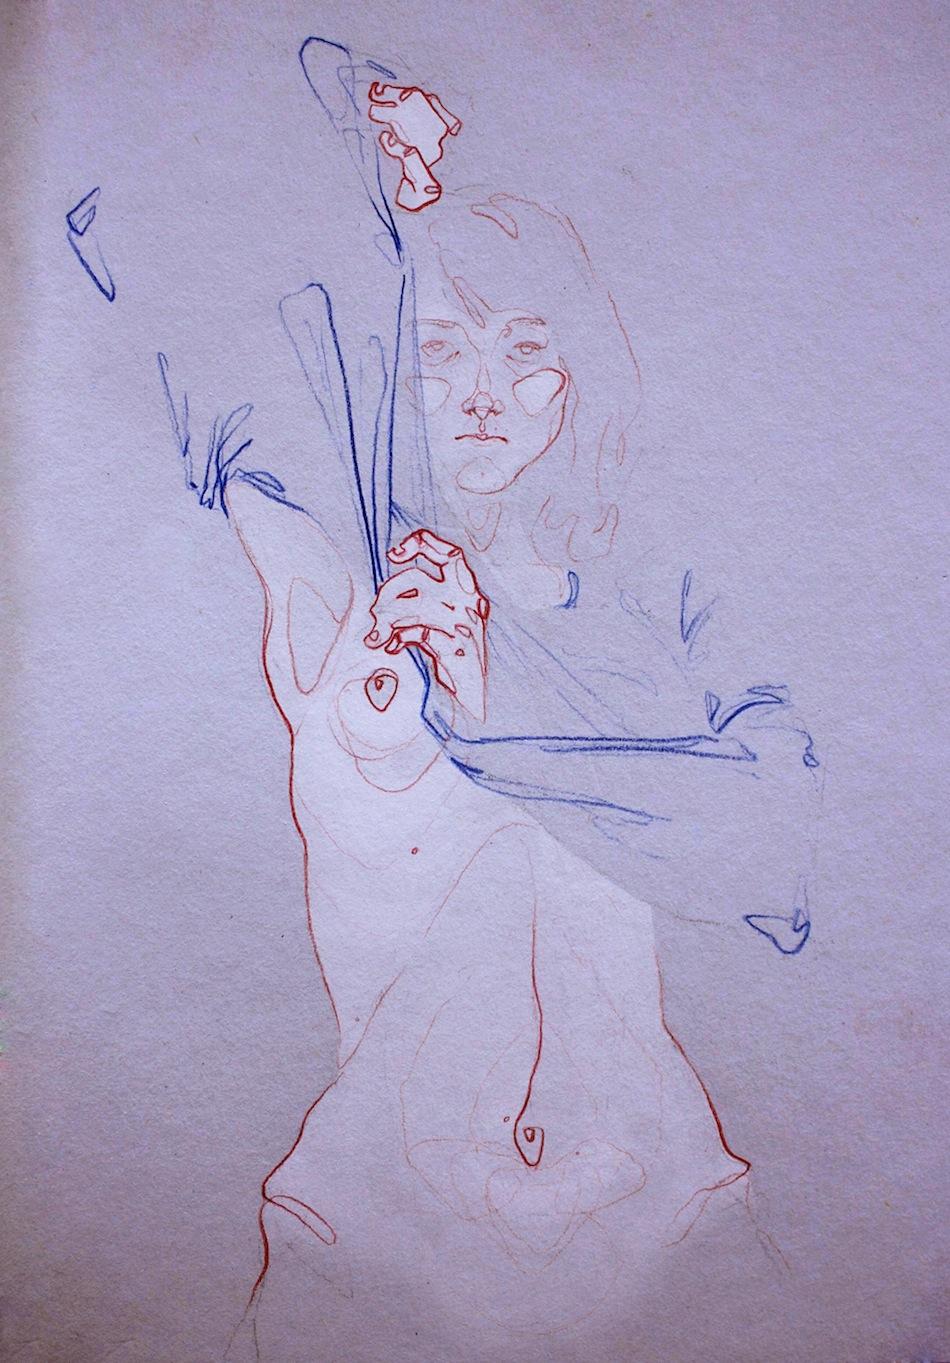 the-tree-mag_drawings-by-adara-snchez-anguiano-220.jpg